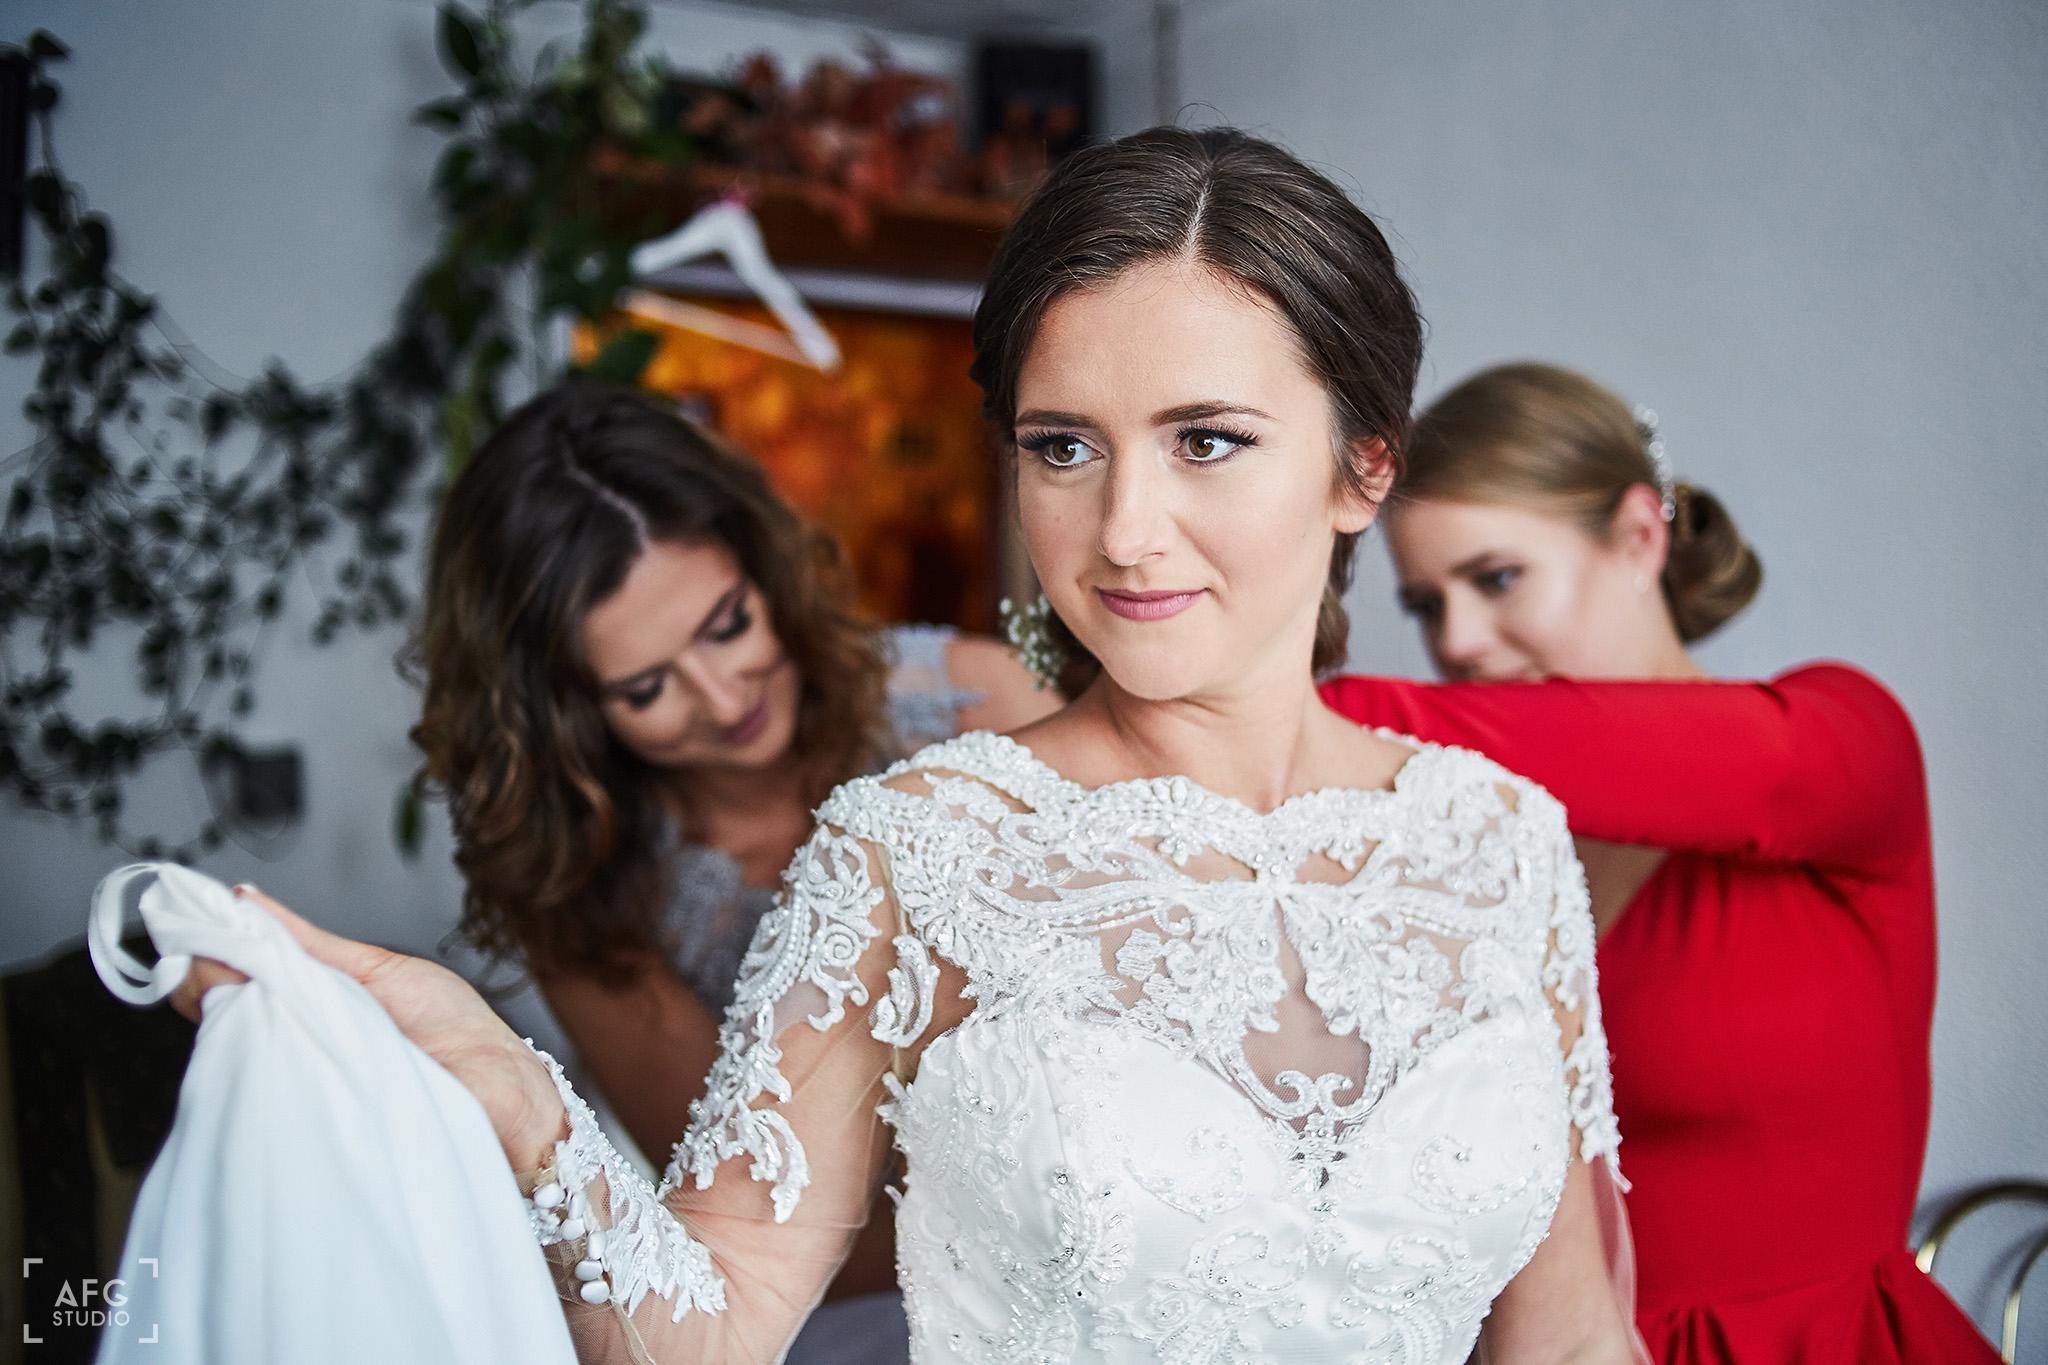 suknia ślubna, welon, pani młoda